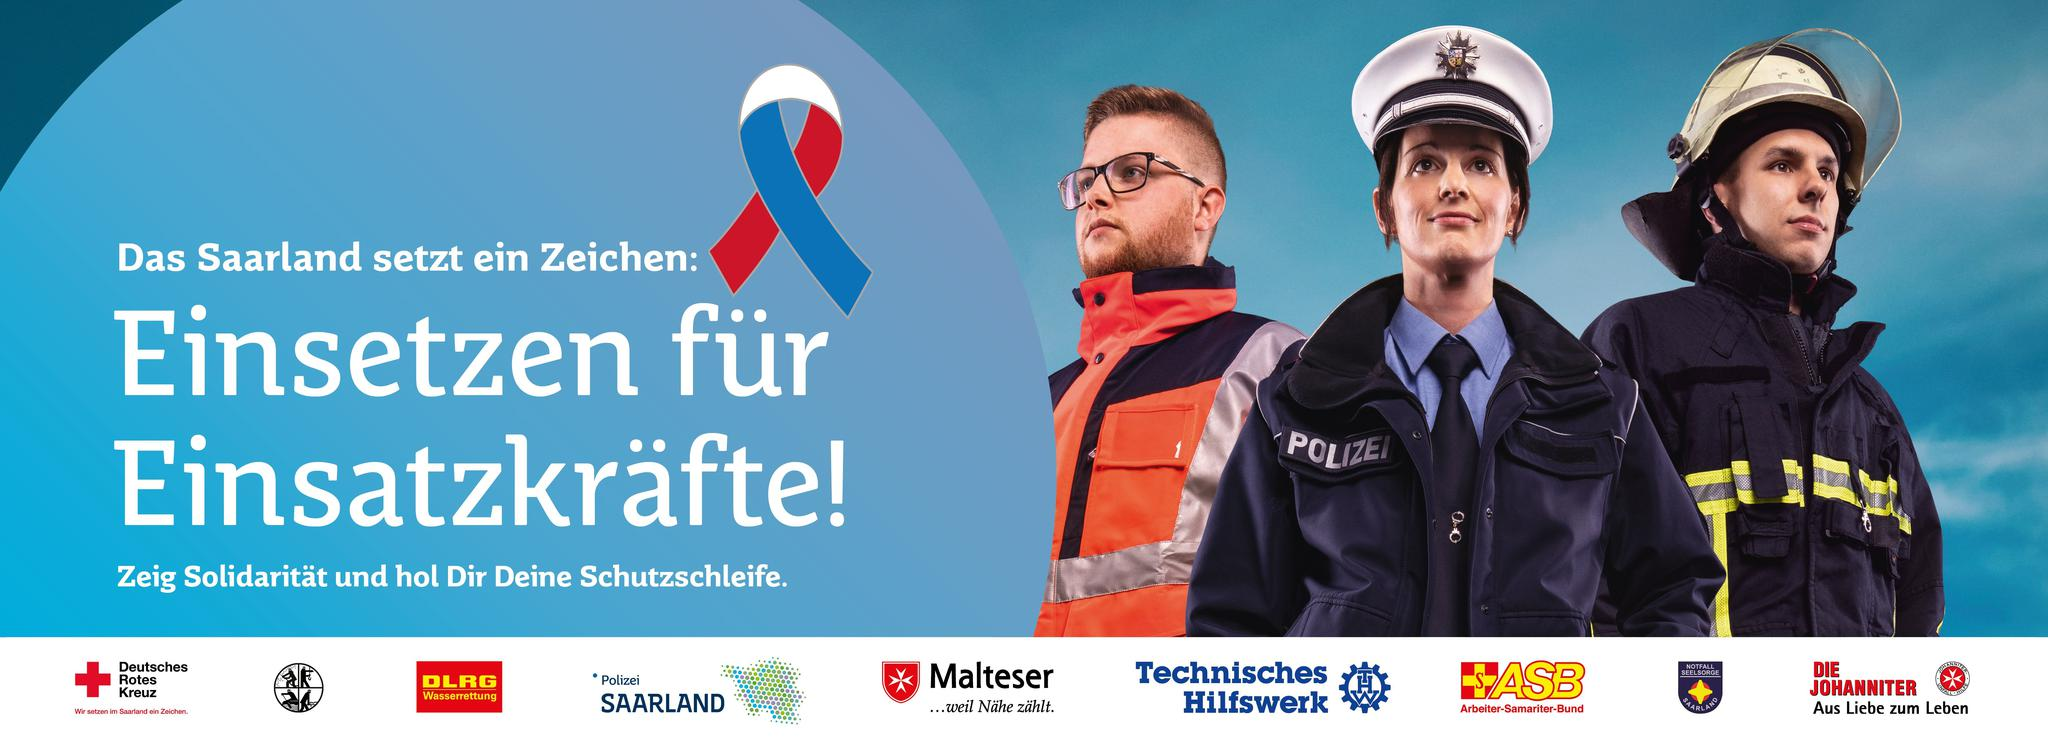 Schutzschleife Saarland